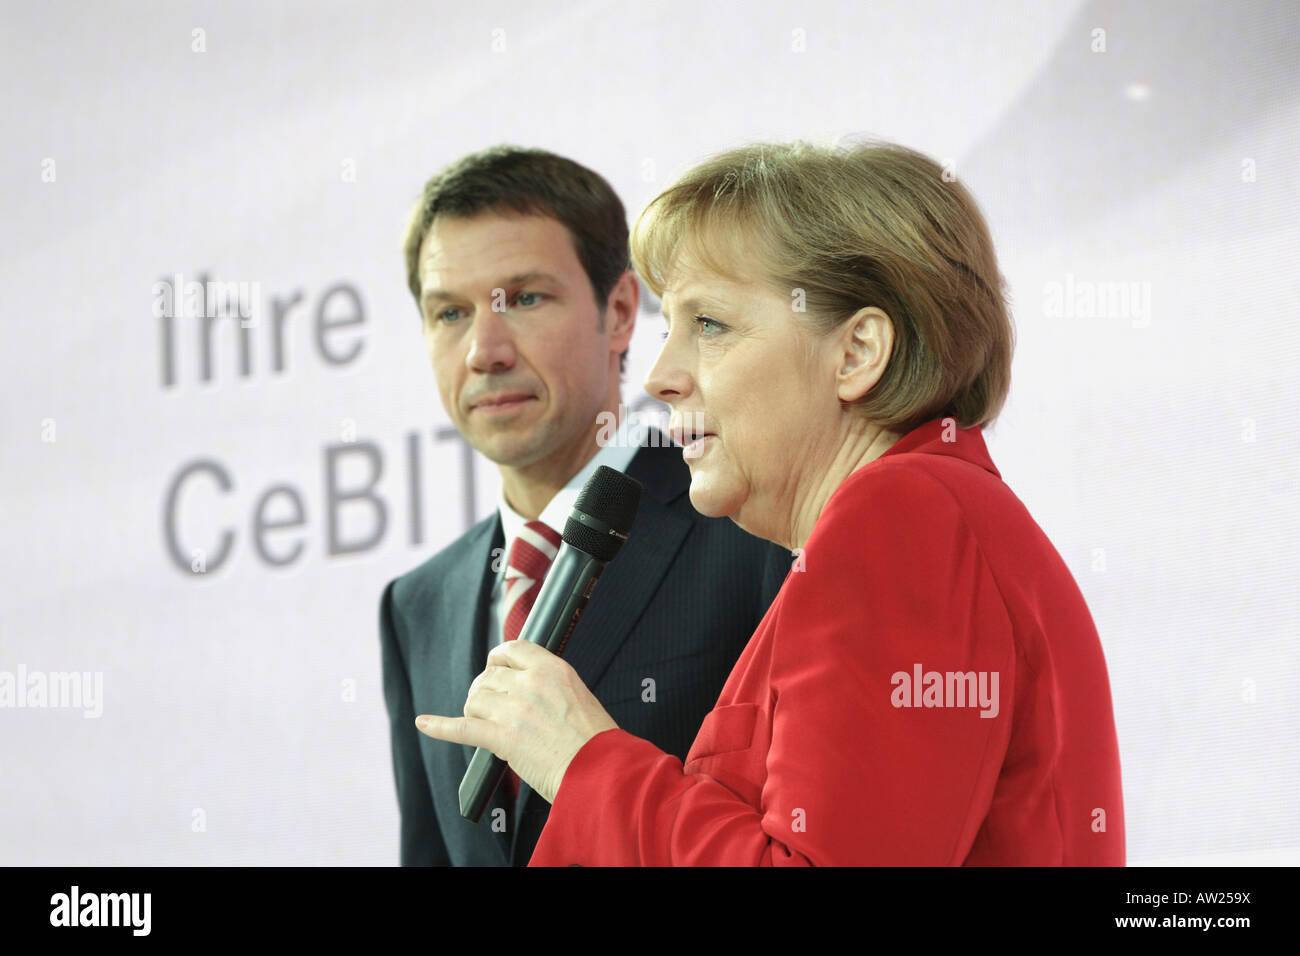 CeBIT 2008 - German chancellor Angela Merkel stands next to Deutsche Telekom CEO Rene Obermann Stock Photo